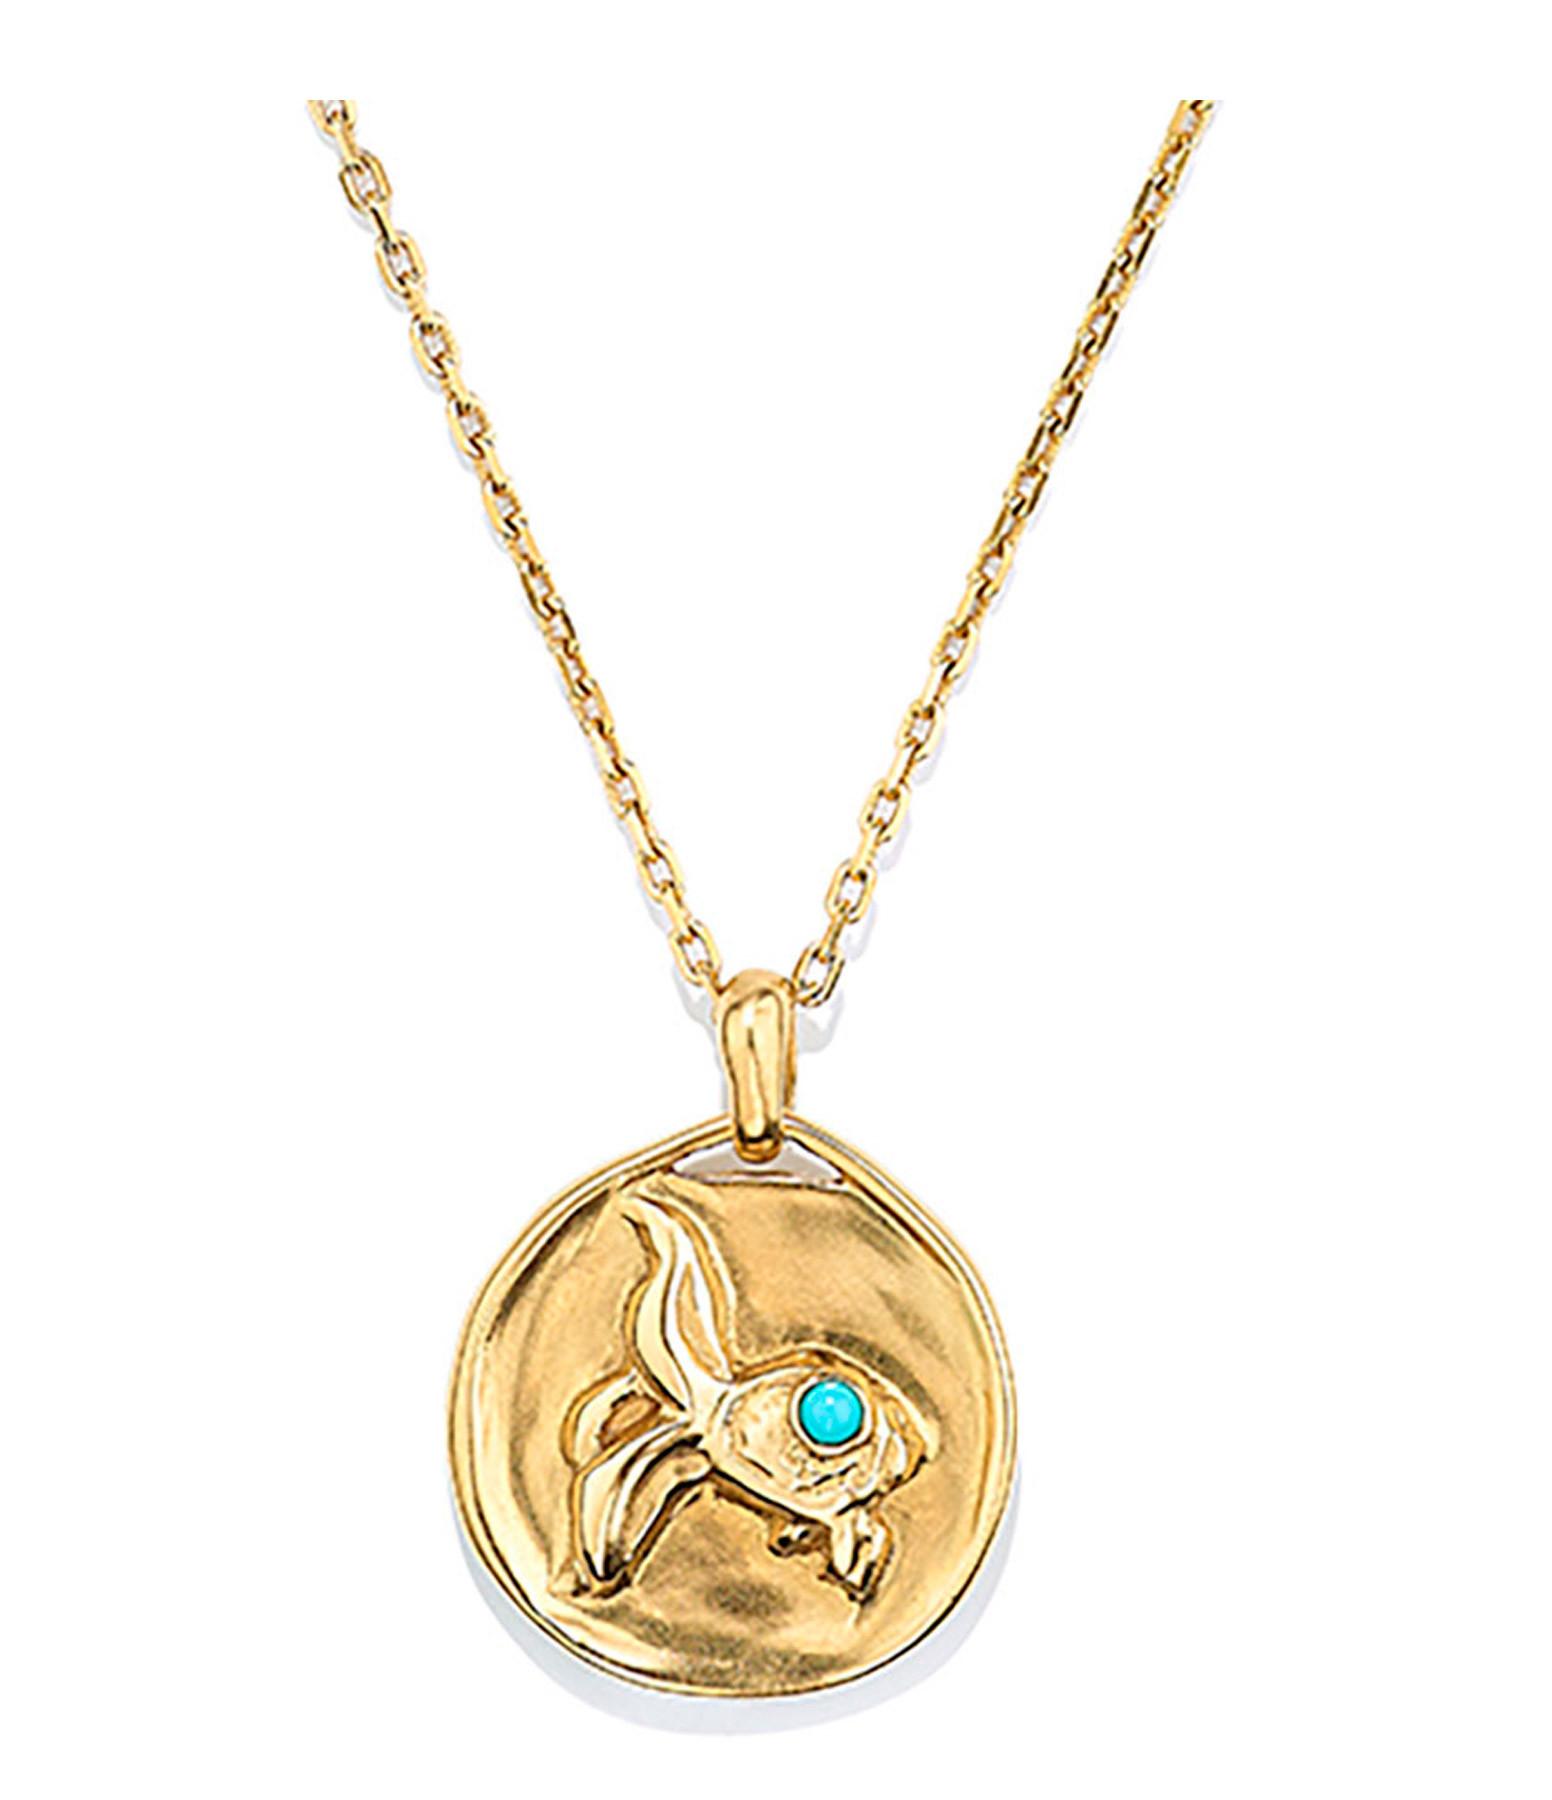 GOOSSENS - Collier Talisman Mini Astro Poisson Turquoise Plaqué Or